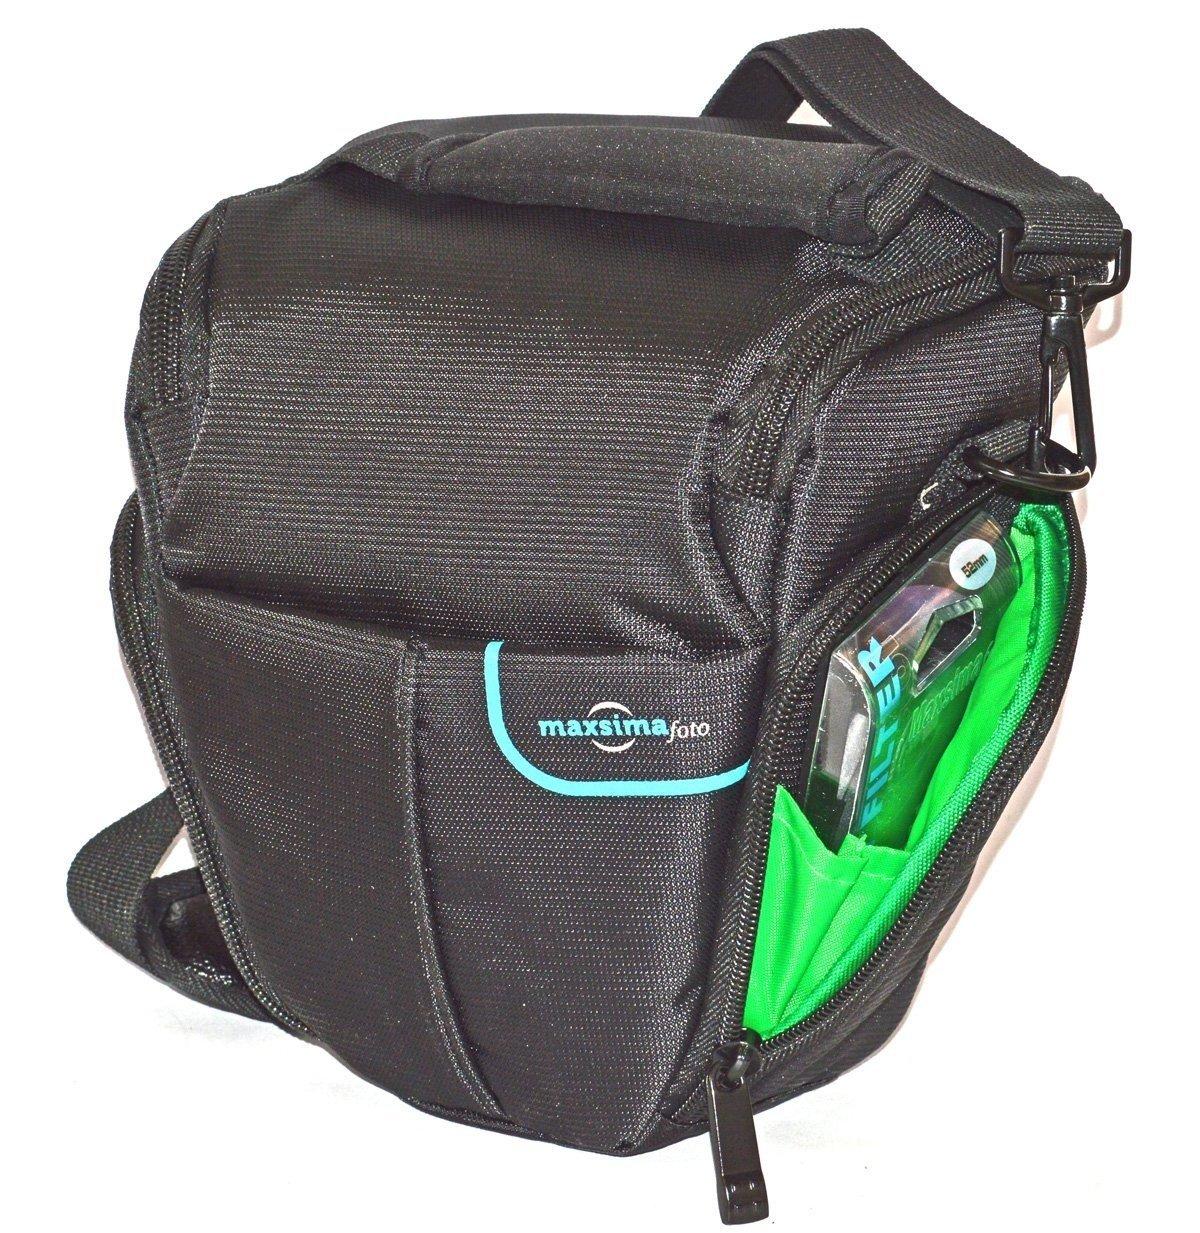 Maxsimafoto - Bolsa para cámara Fujifilm Finepix (modelos S7000 ...